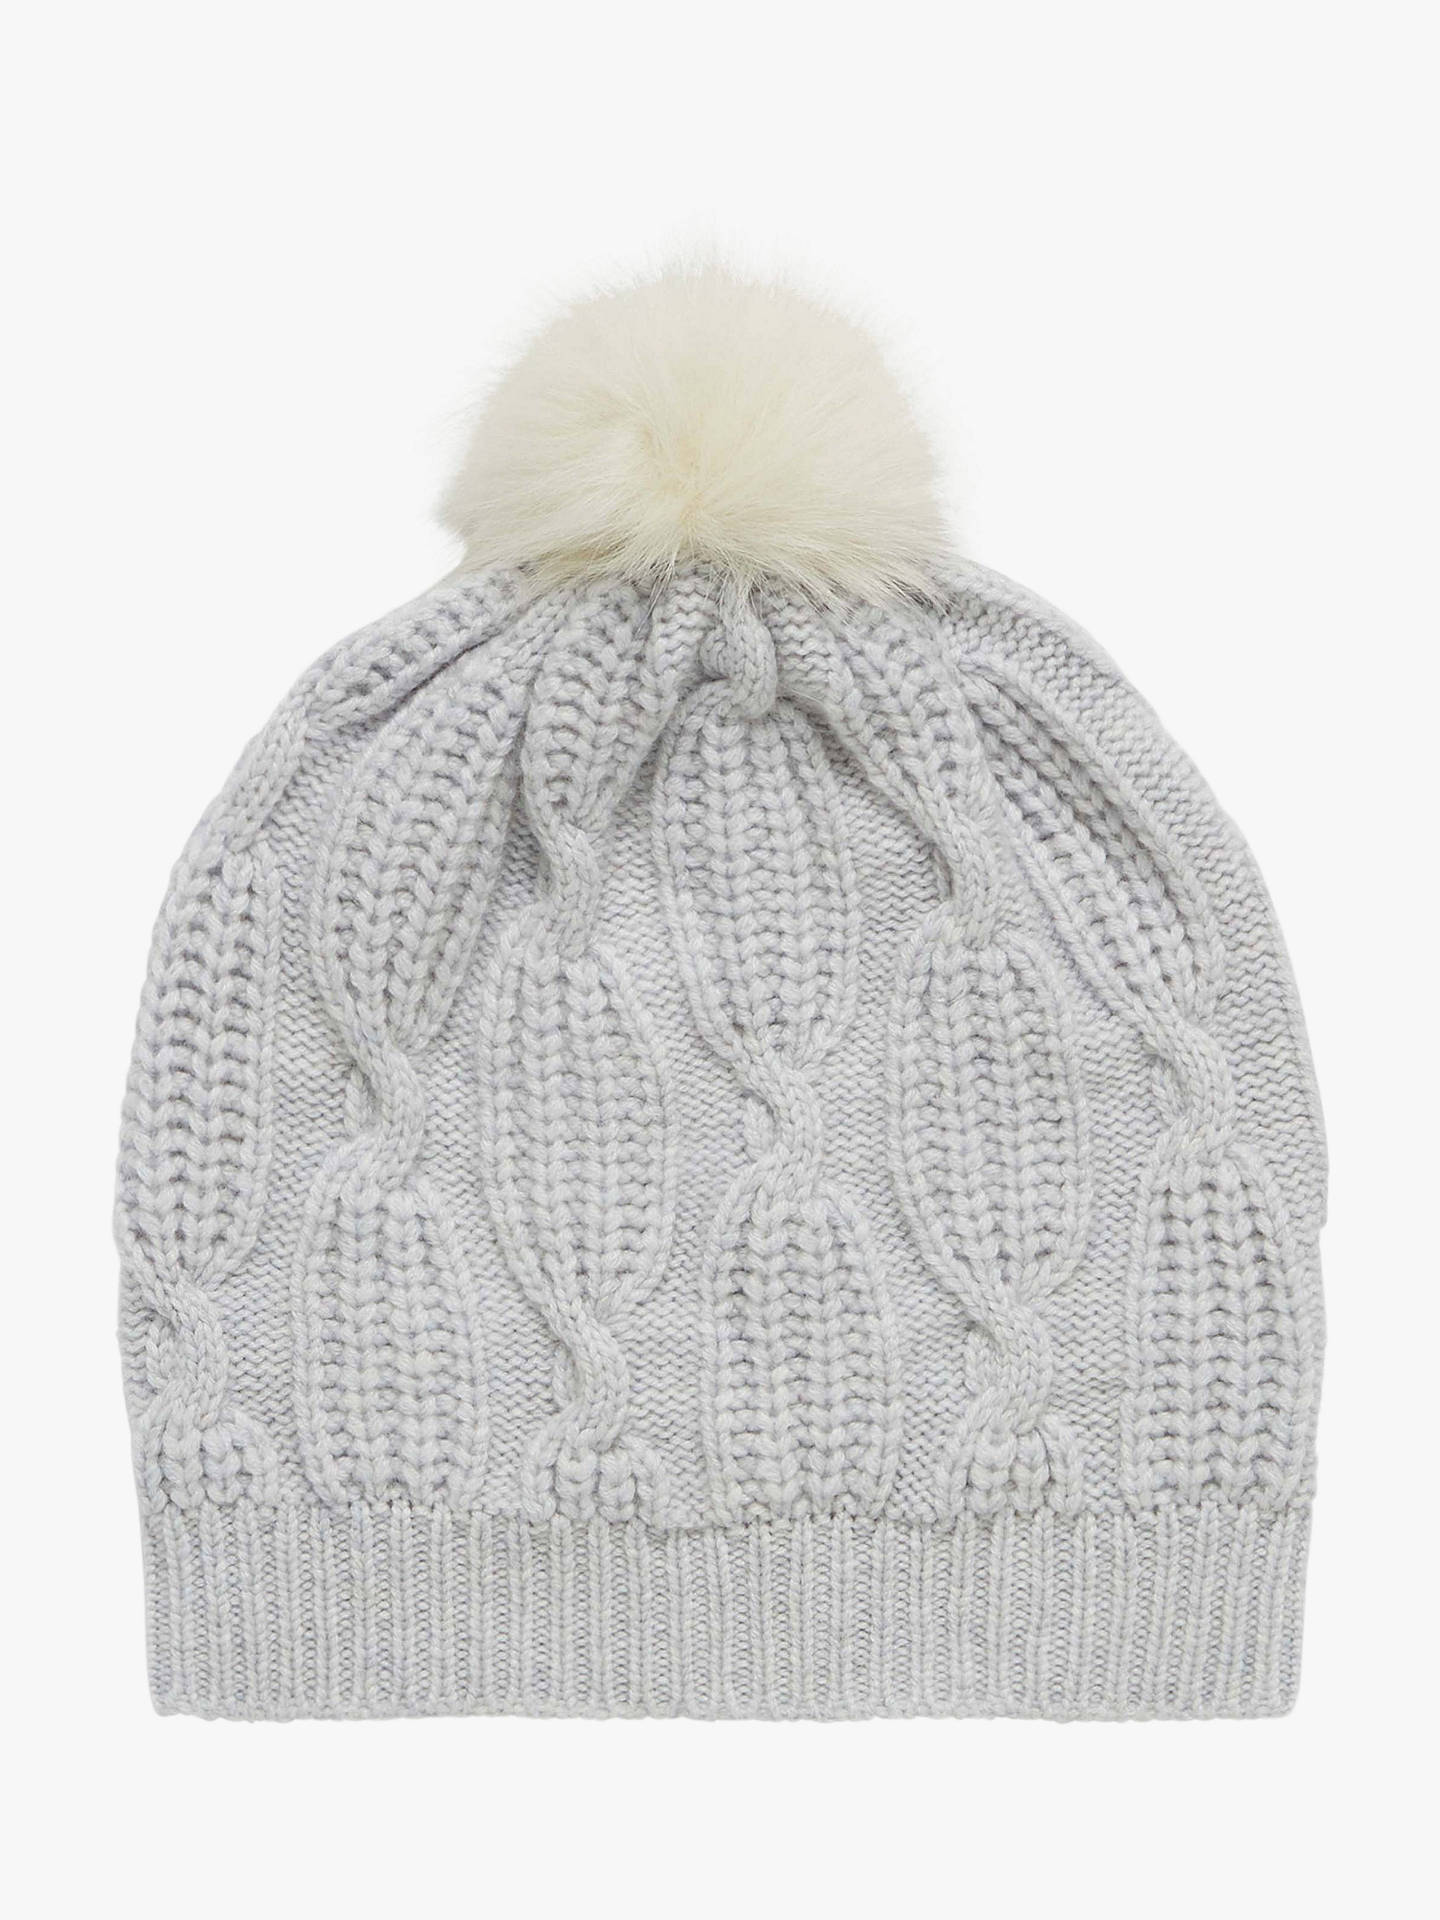 32d894e0f54d3b Brora Cashmere Knit Pom-Pom Beanie Hat at John Lewis & Partners